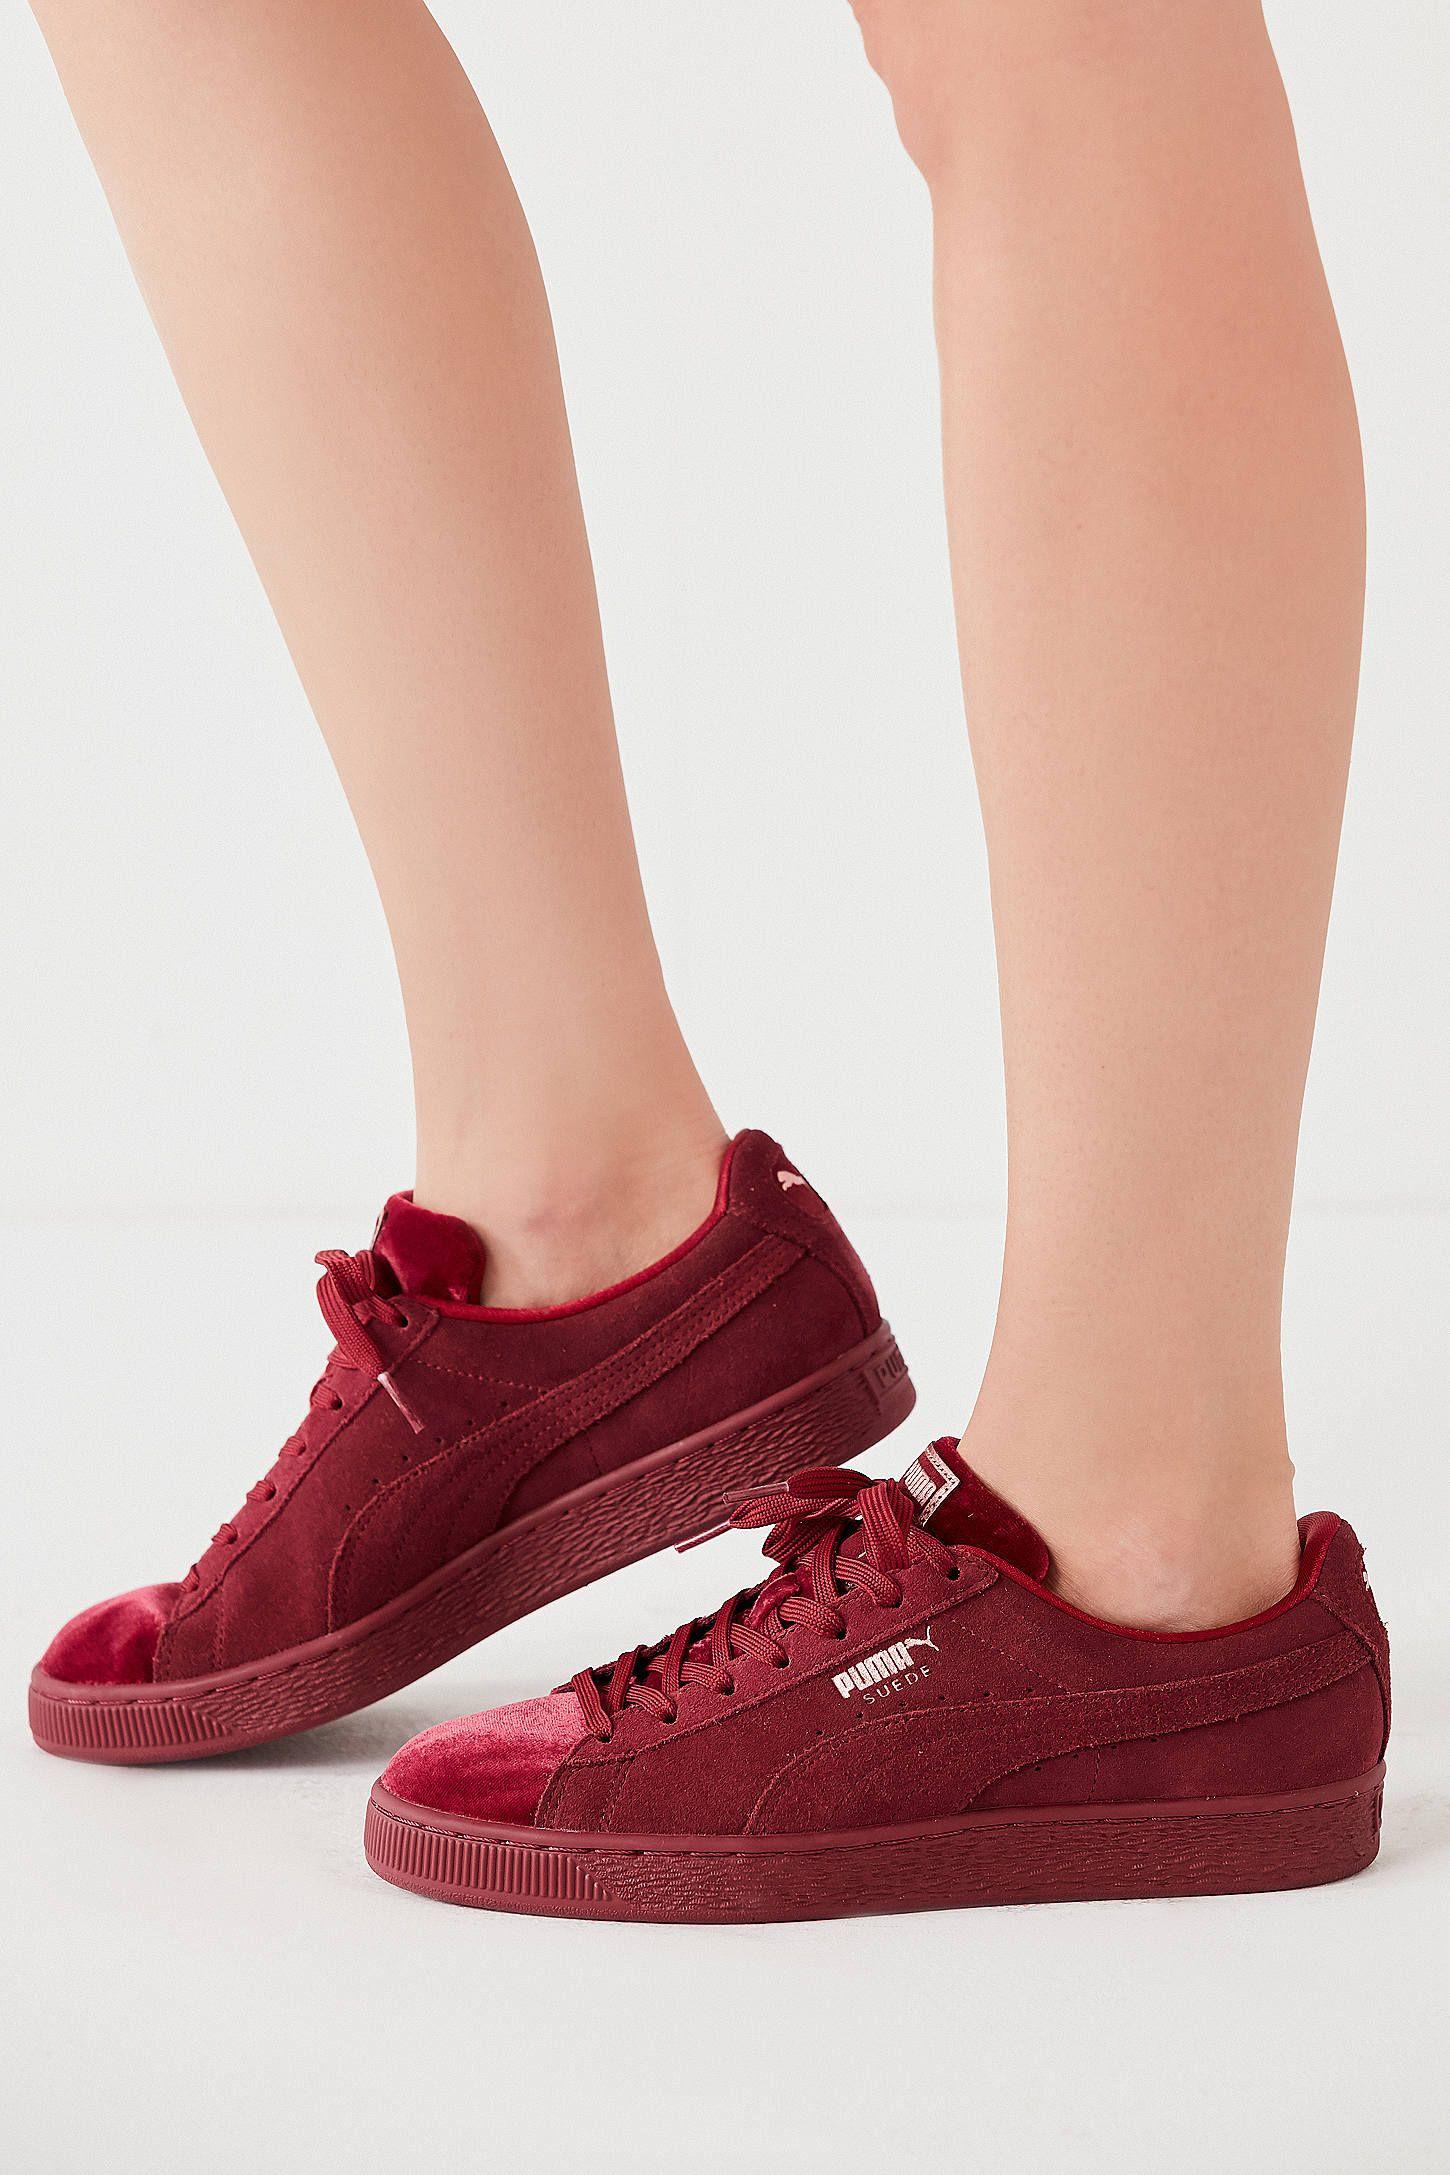 1633f3aa8fa9 Puma Suede Classic Velvet Sneaker